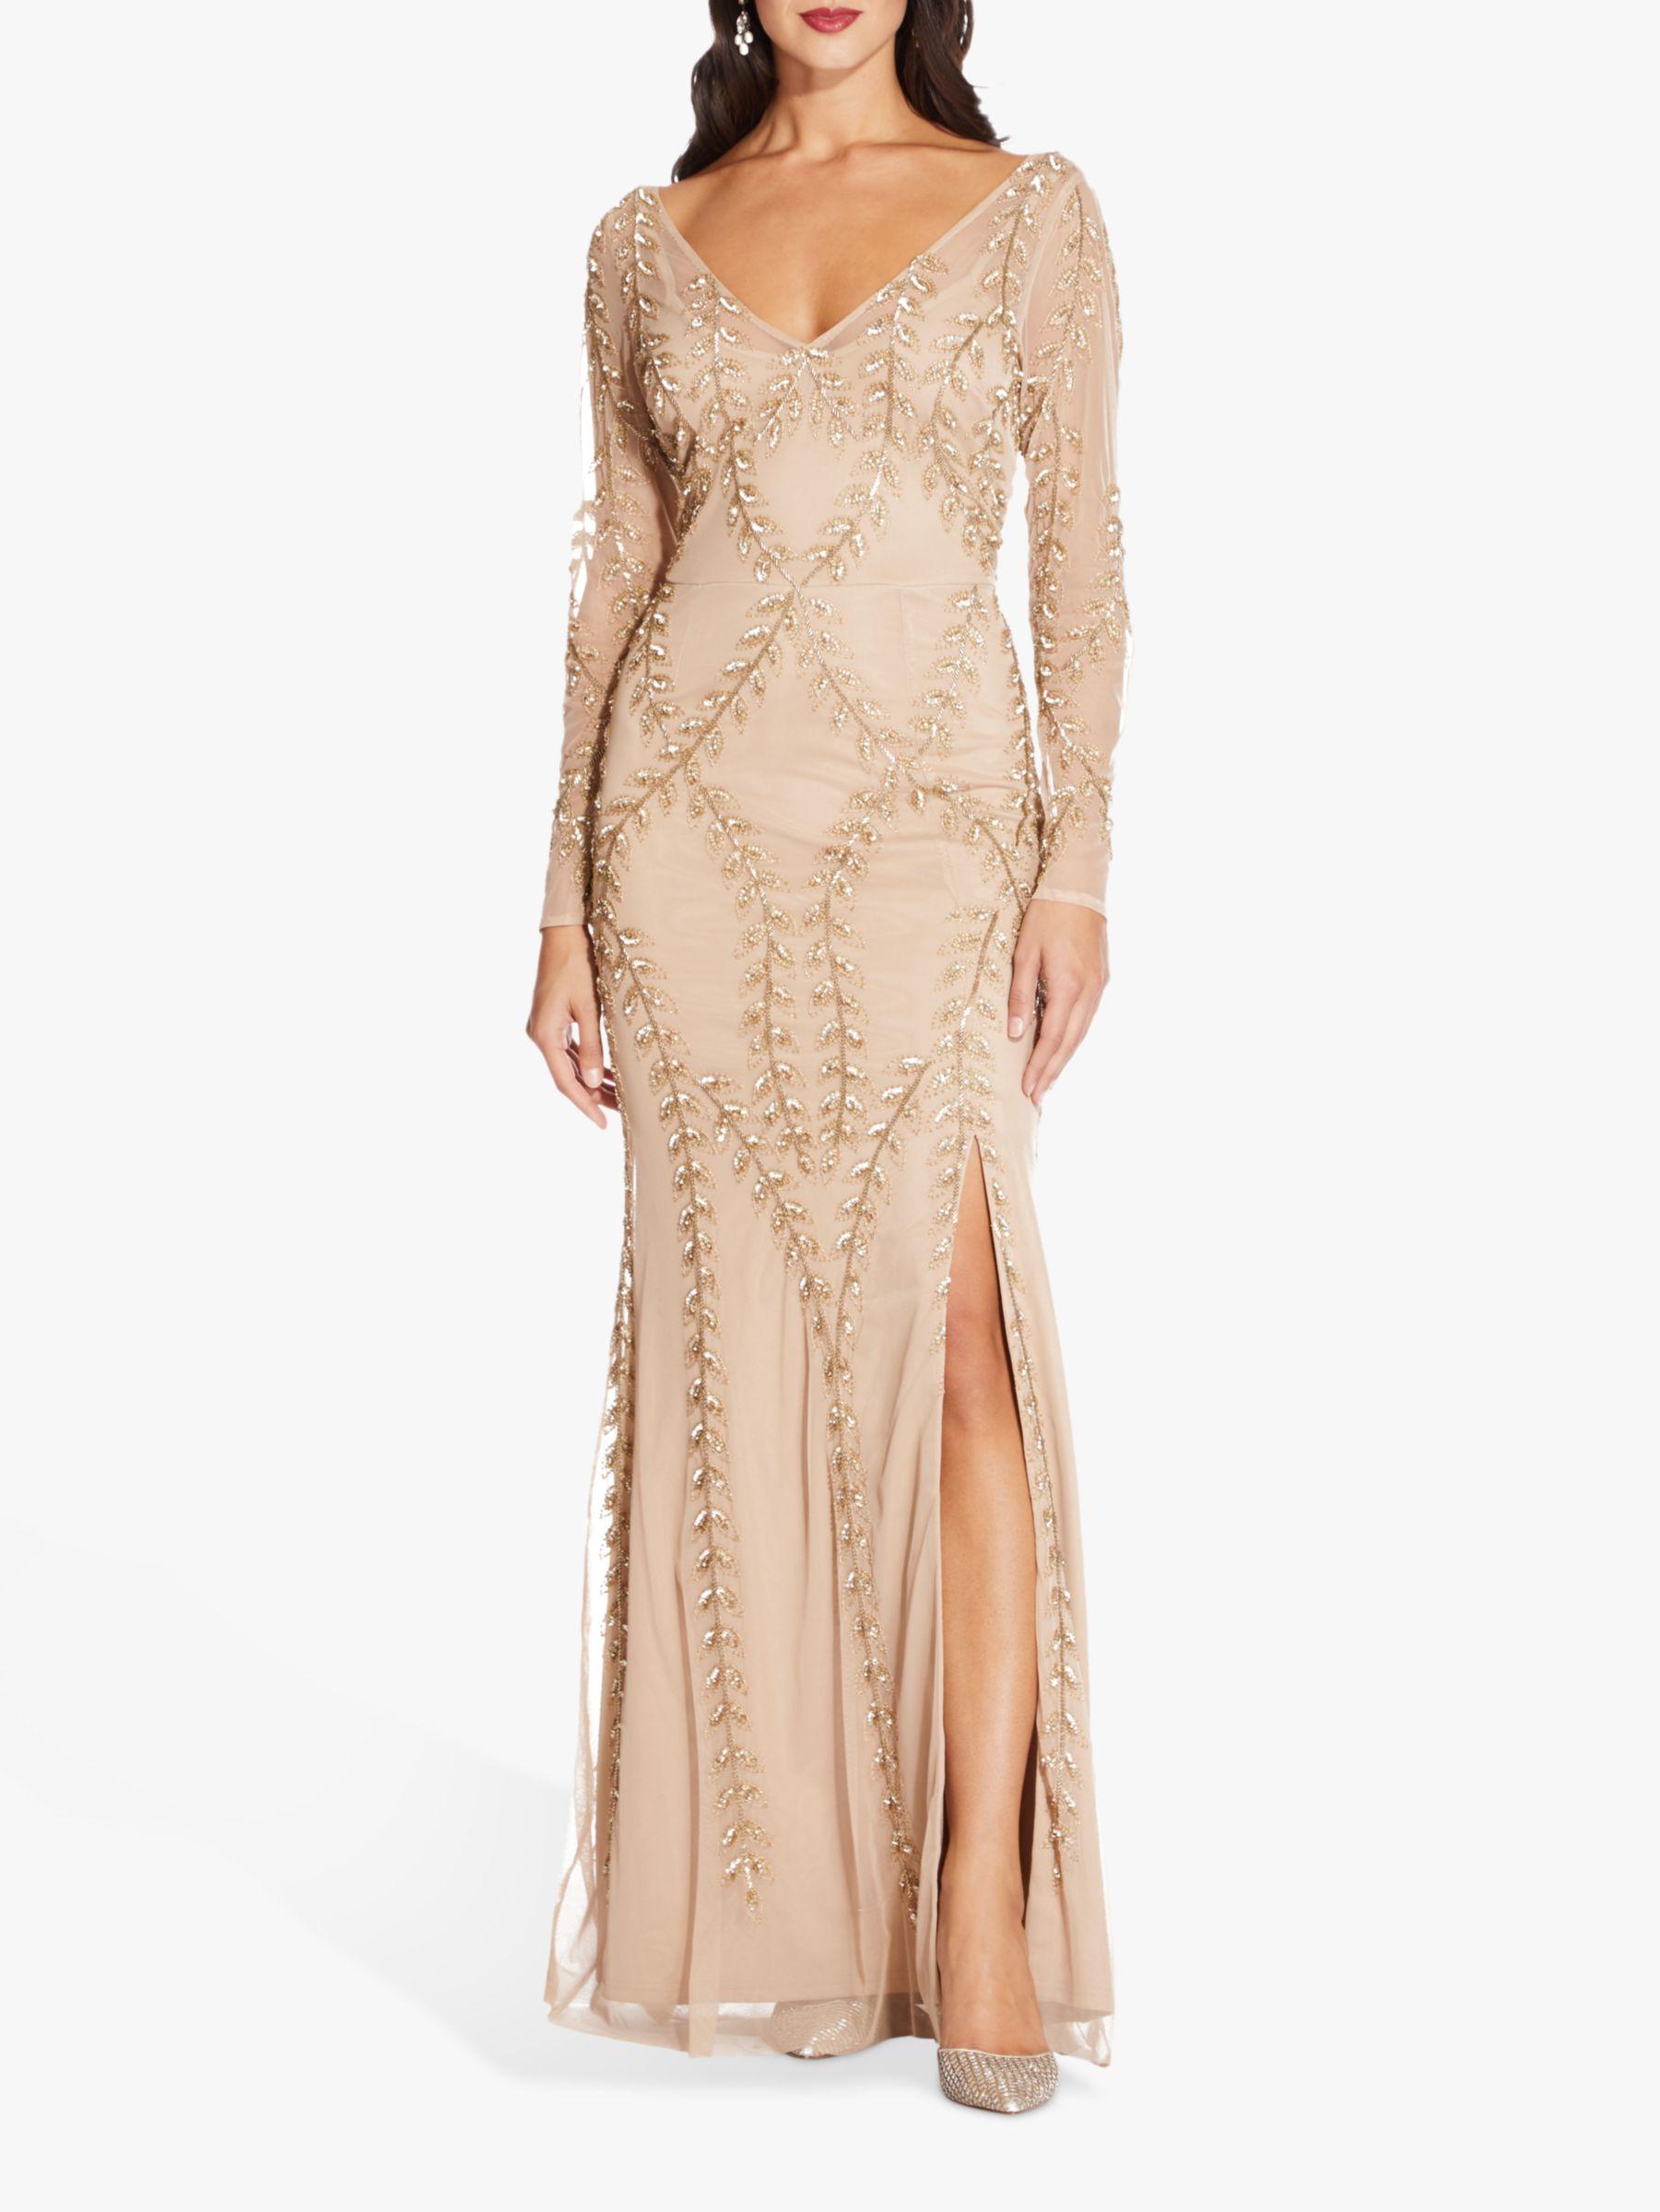 Long Beaded Dresses,Long Beaded Dresses, Long Sleeve Beaded Dress,Long Sleeve Beaded Dress,Champagne Beaded Dress,beaded dress,